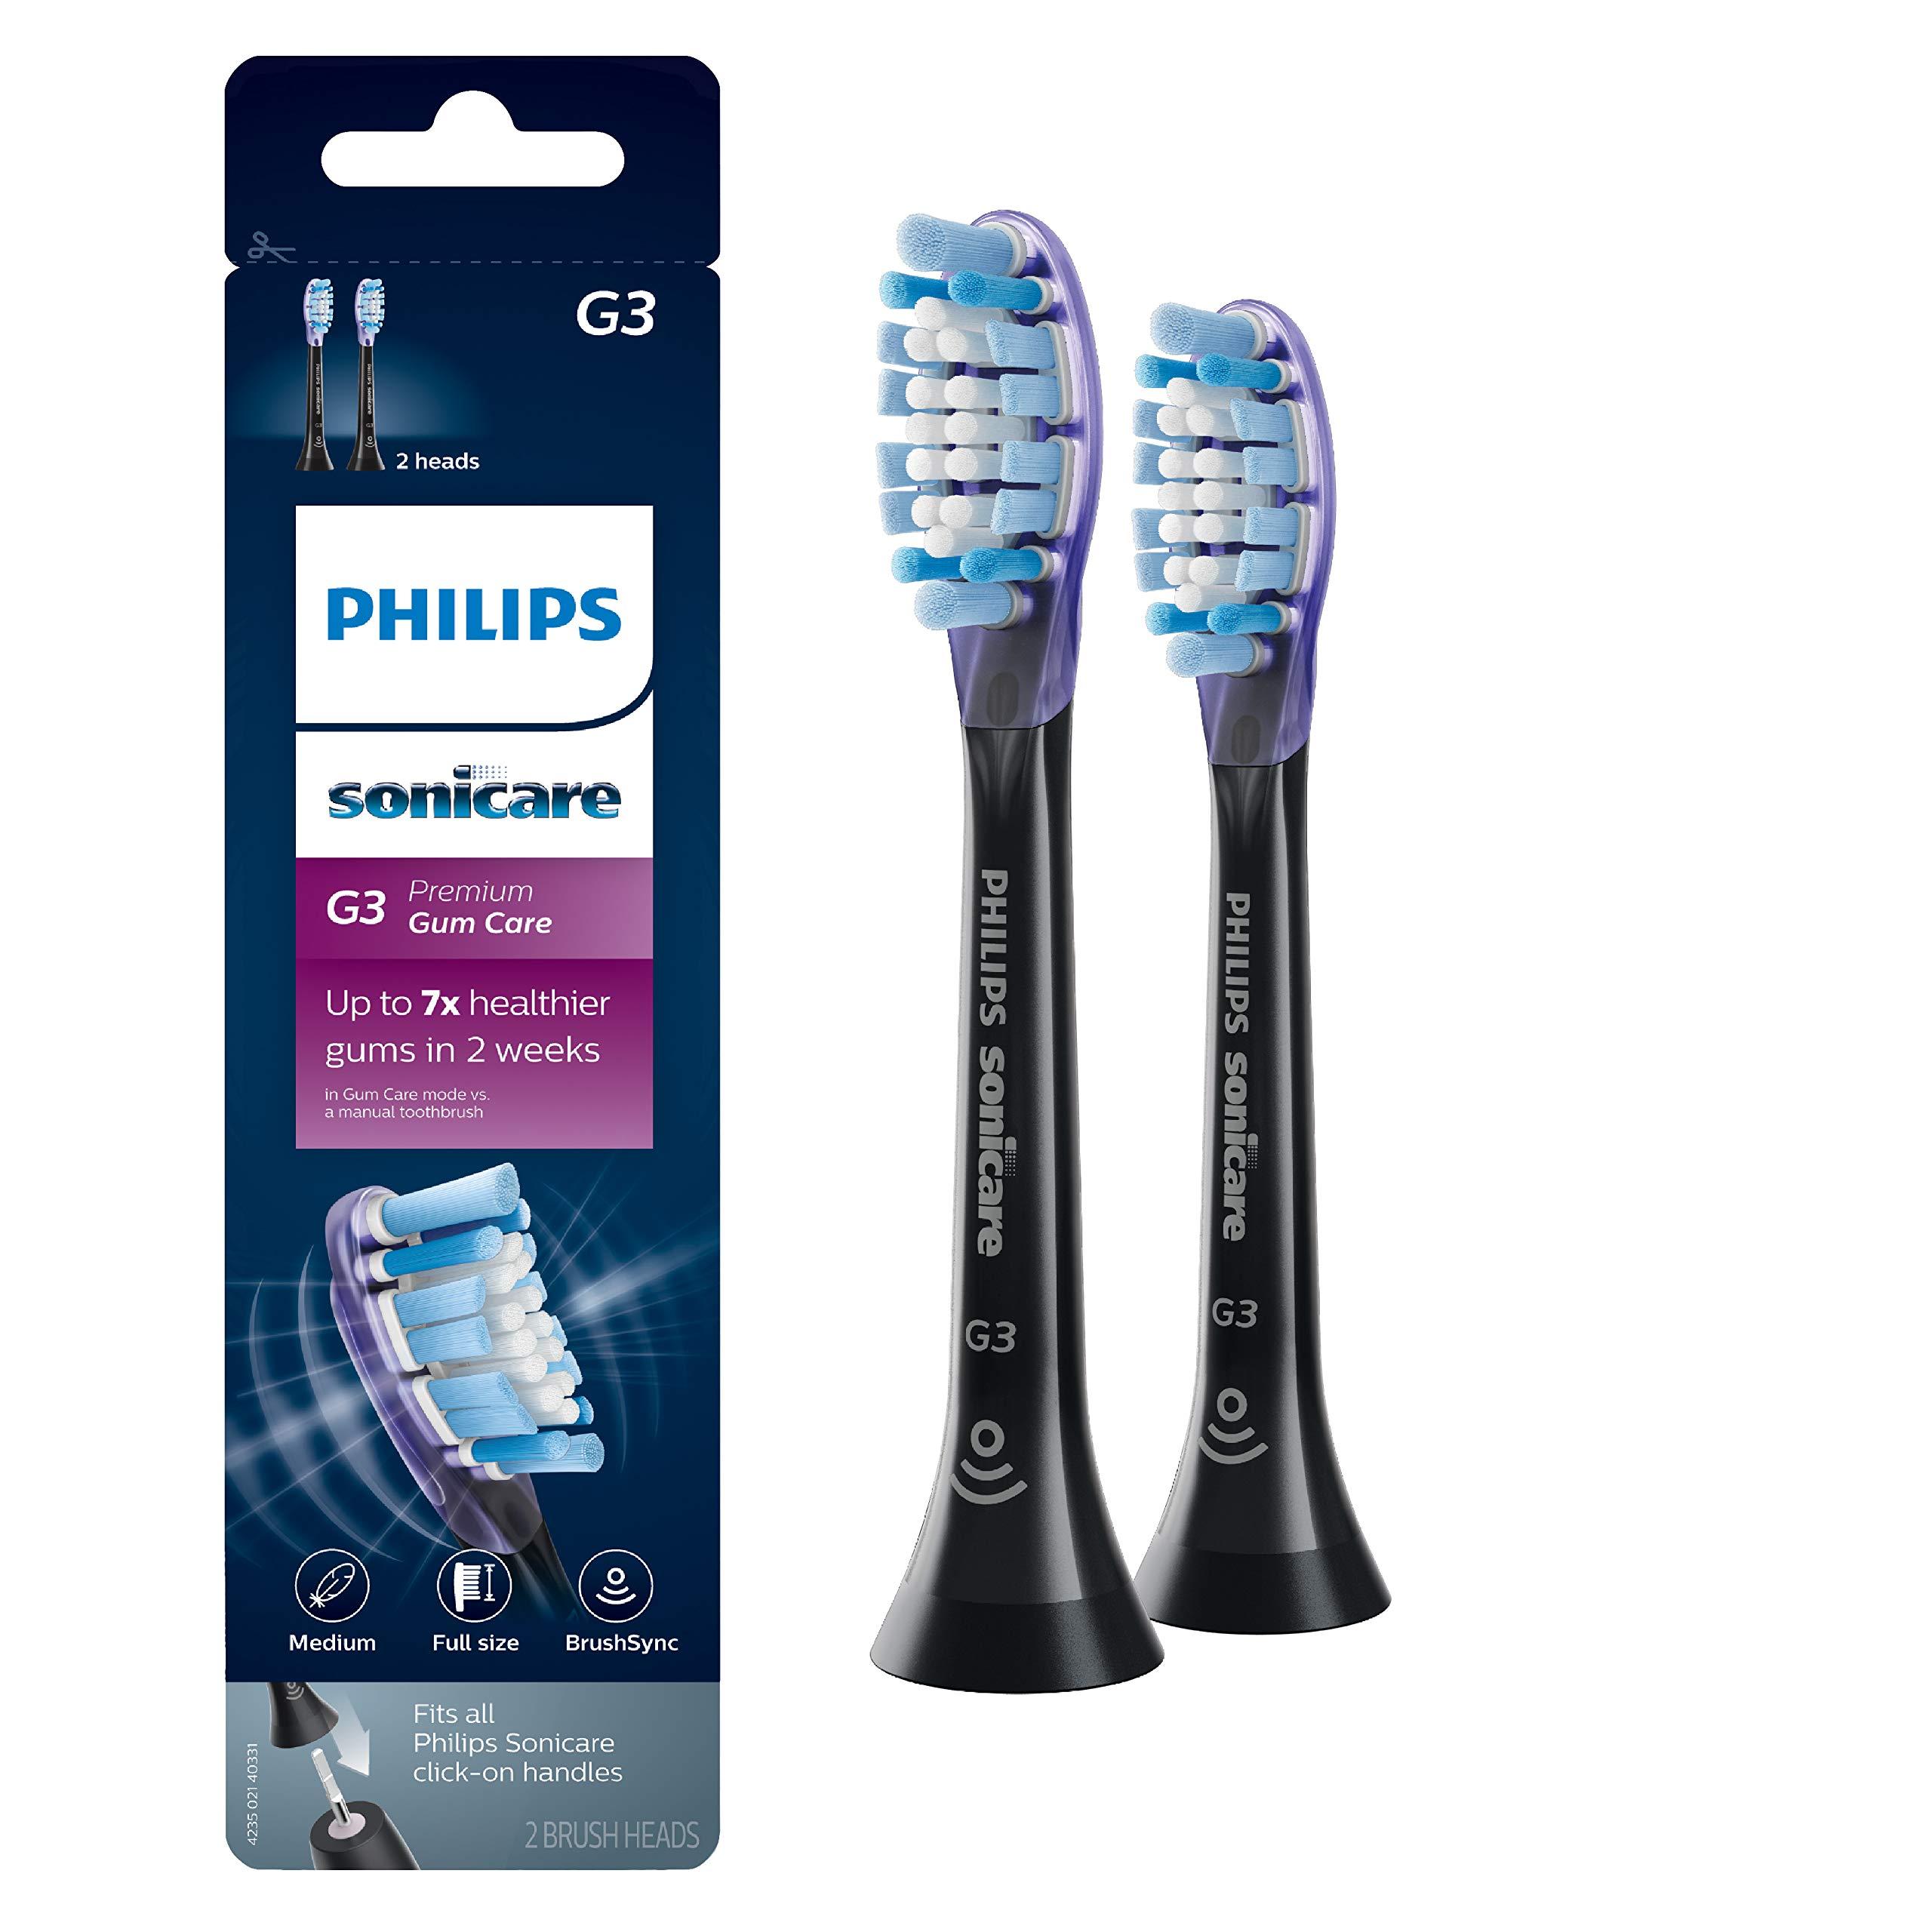 Genuine Philips Sonicare G3 Premium Gum Care Toothbrush Head, HX9052/95, 2-pk, White by Philips Sonicare